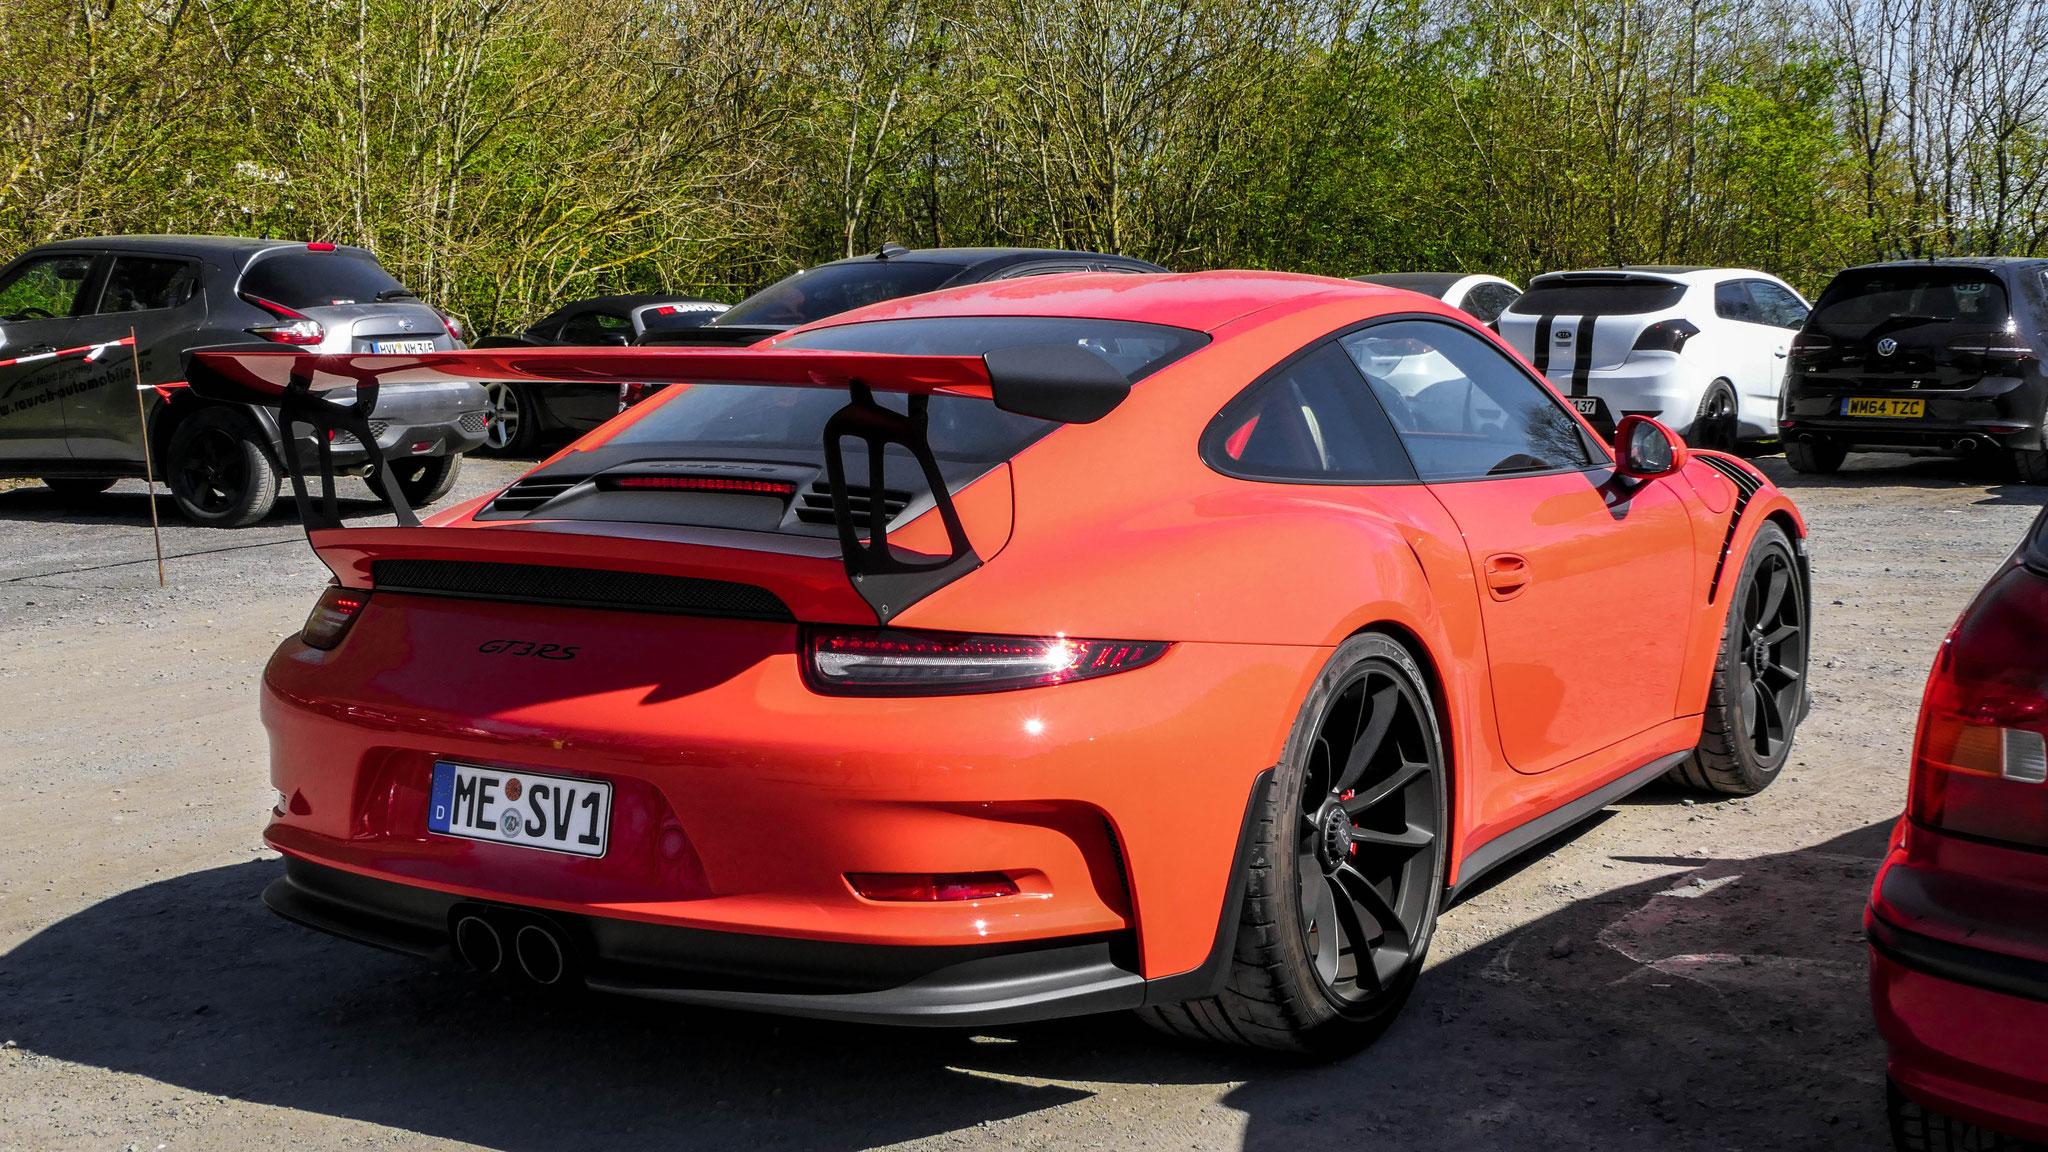 Porsche 911 GT3 RS - ME-SV-1